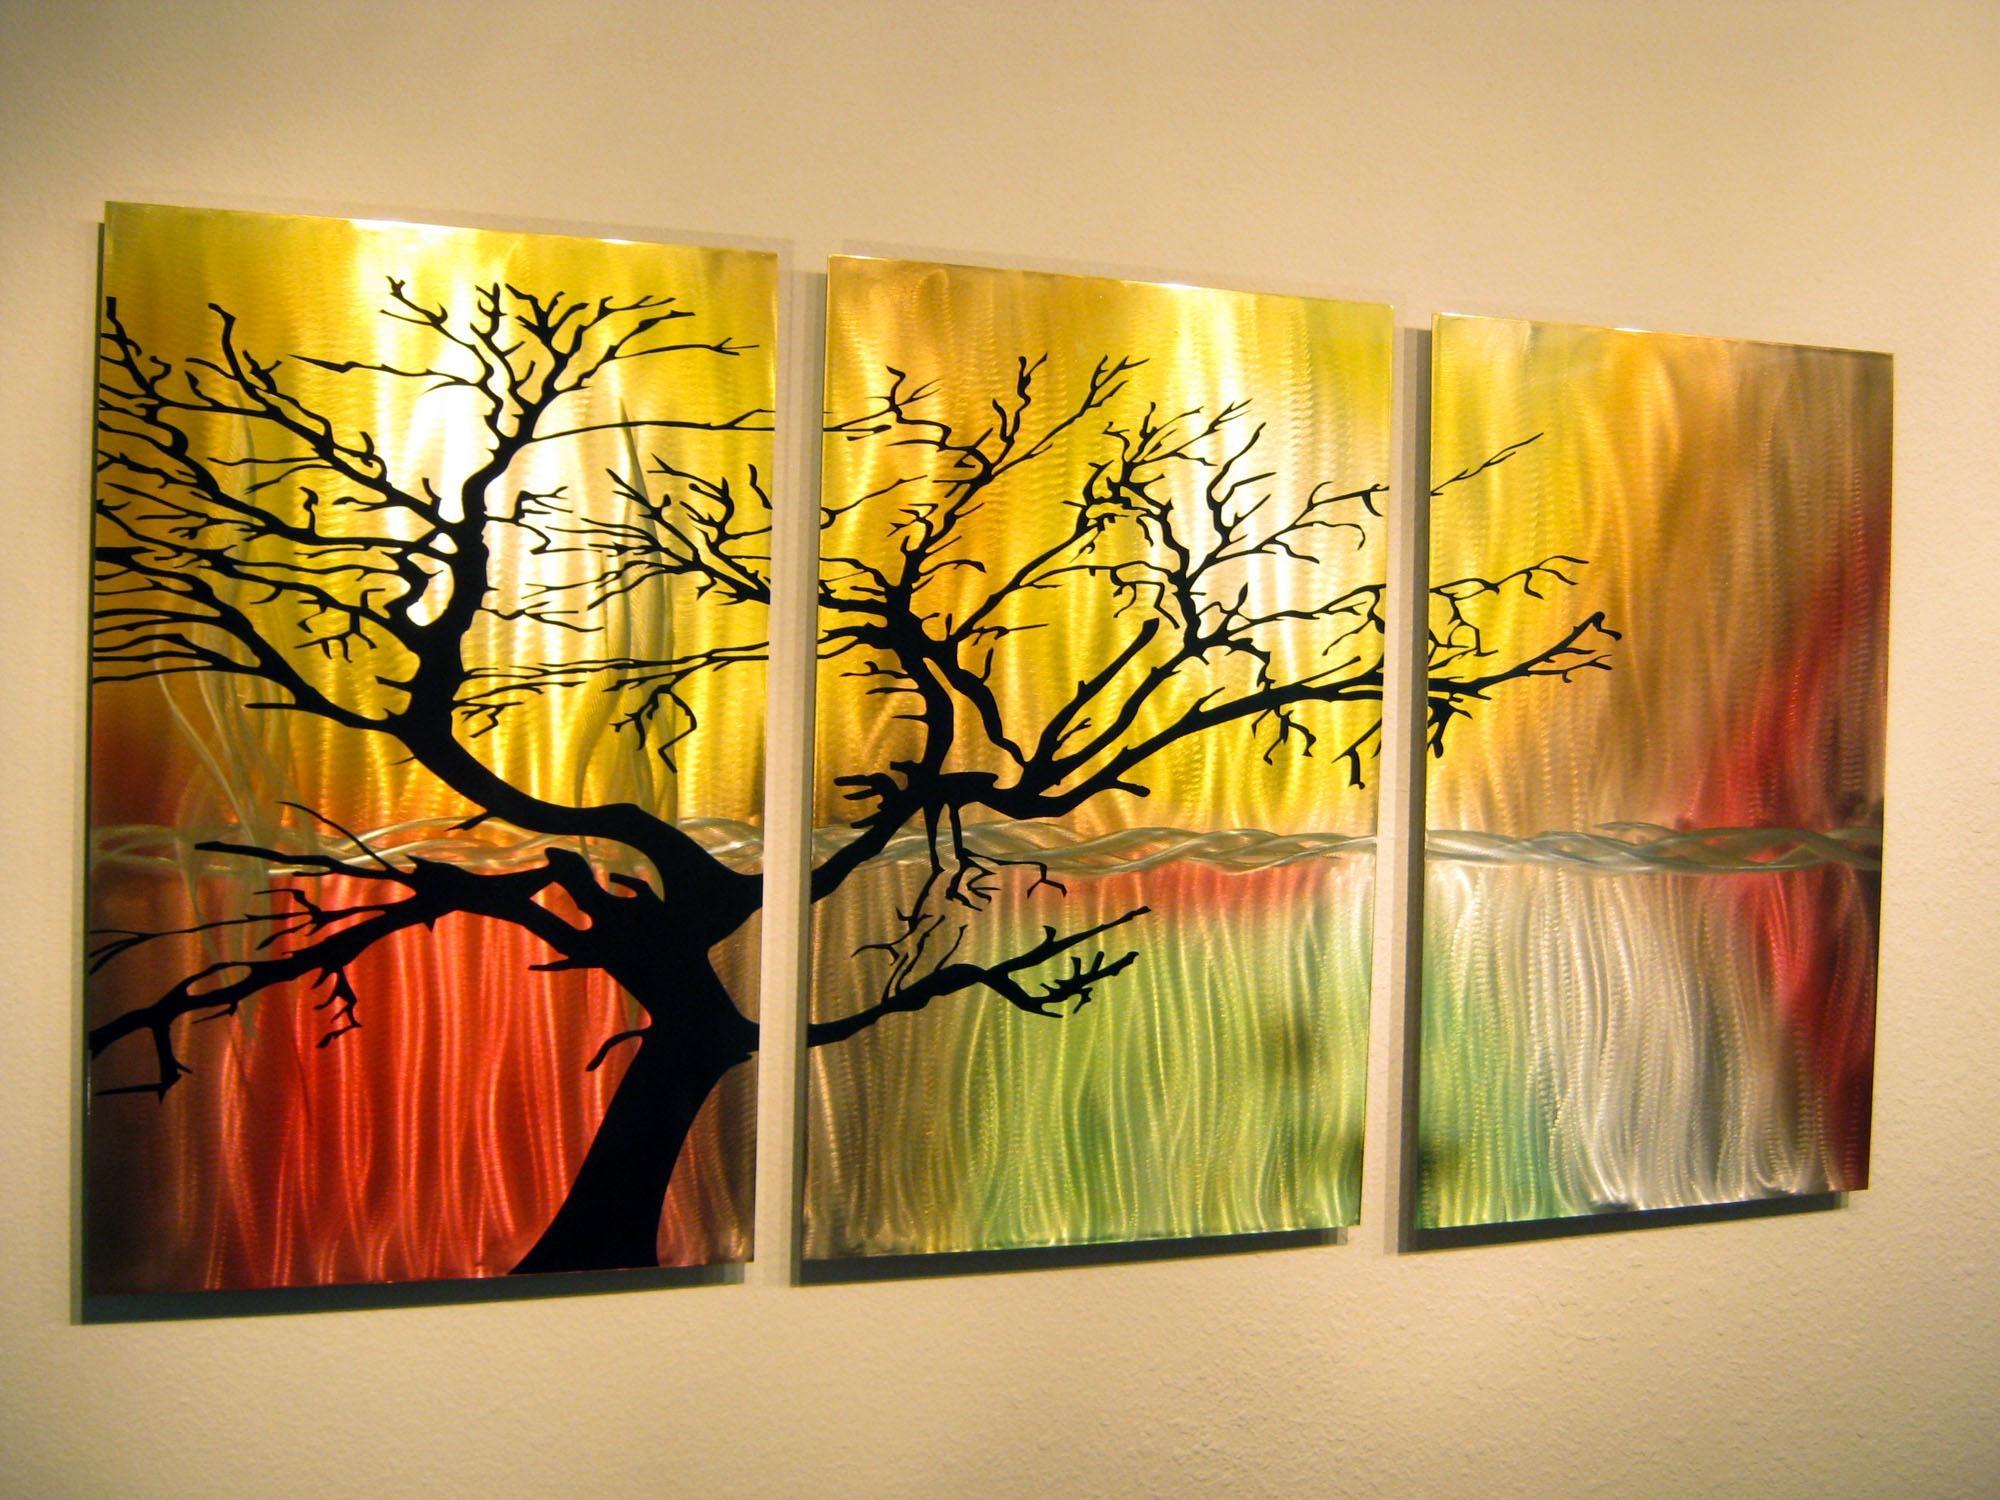 Wall Art Panels. Amazing Decorative Metal Wall Art Panels H16 On ...